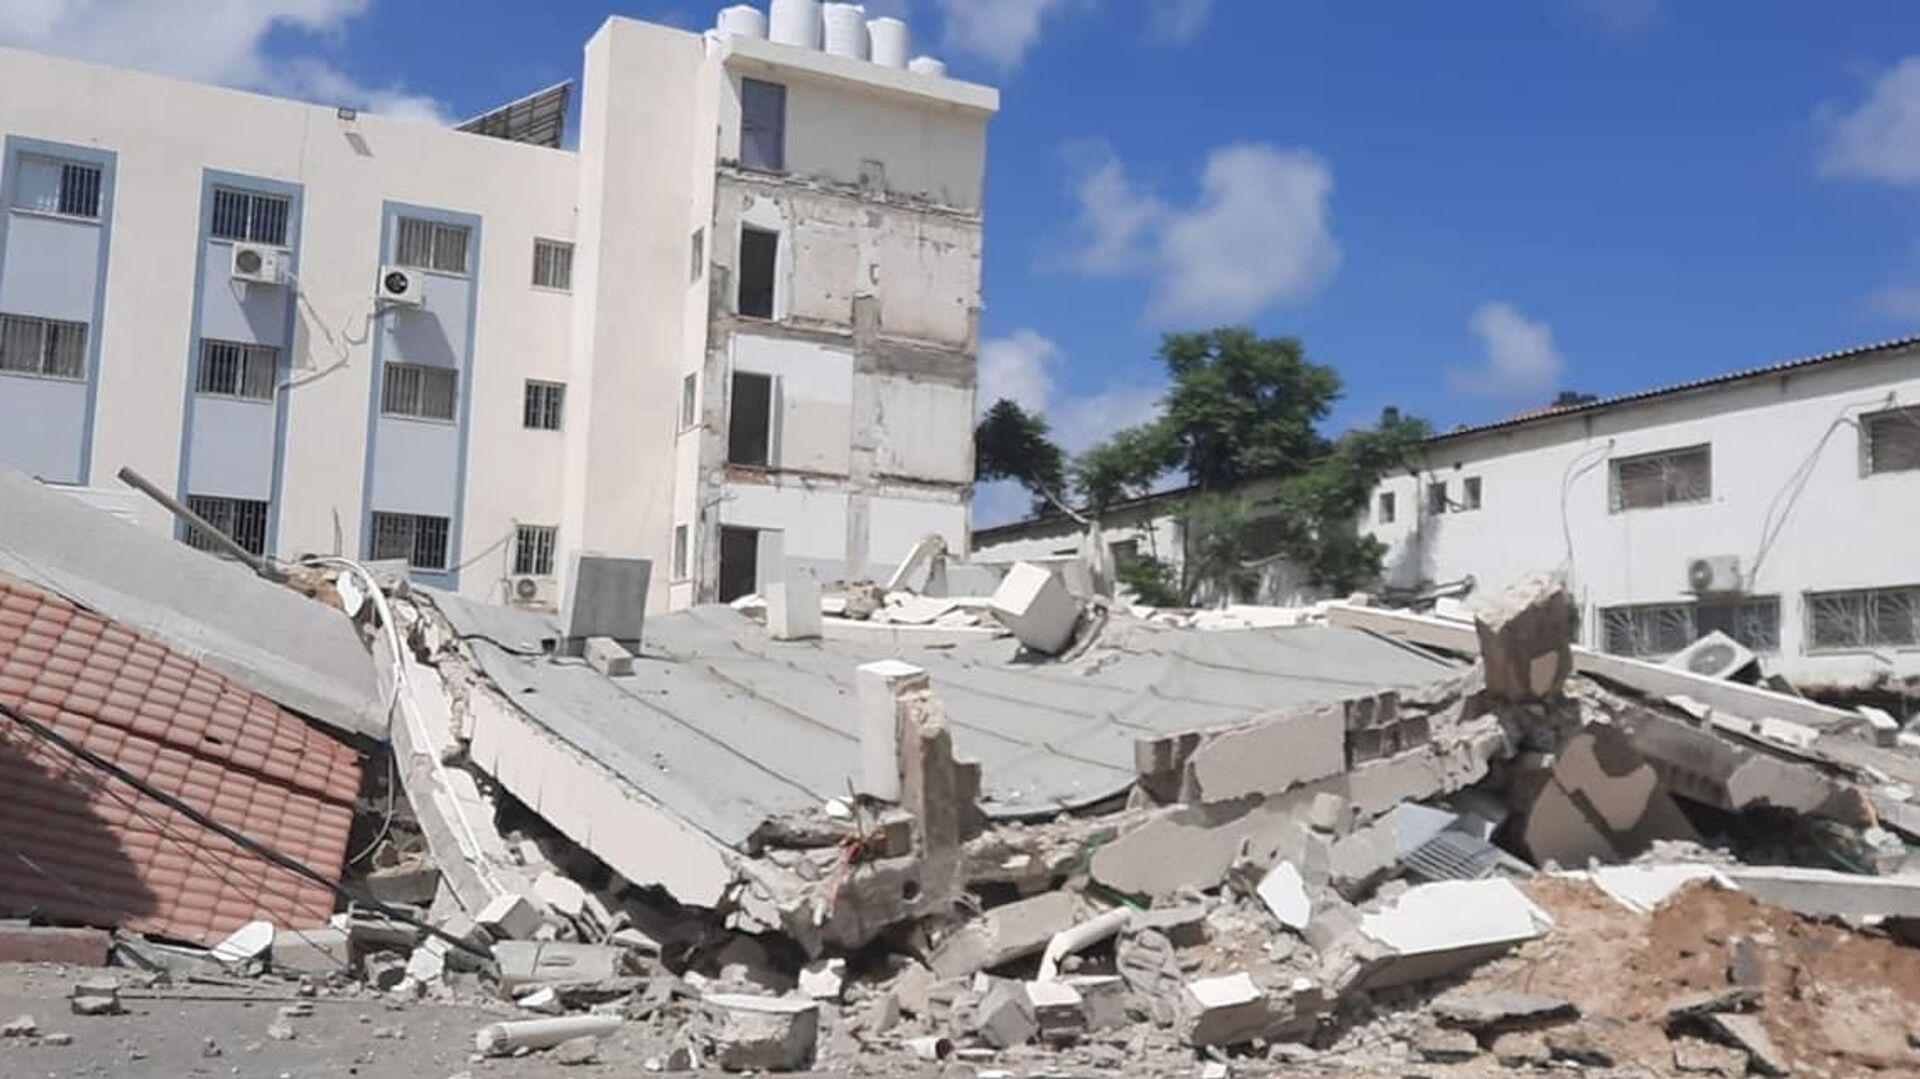 Una situazione drammatica a Gaza dopo una nuova escalation di violenza tra israeliani e palestinesi - Sputnik Italia, 1920, 20.05.2021